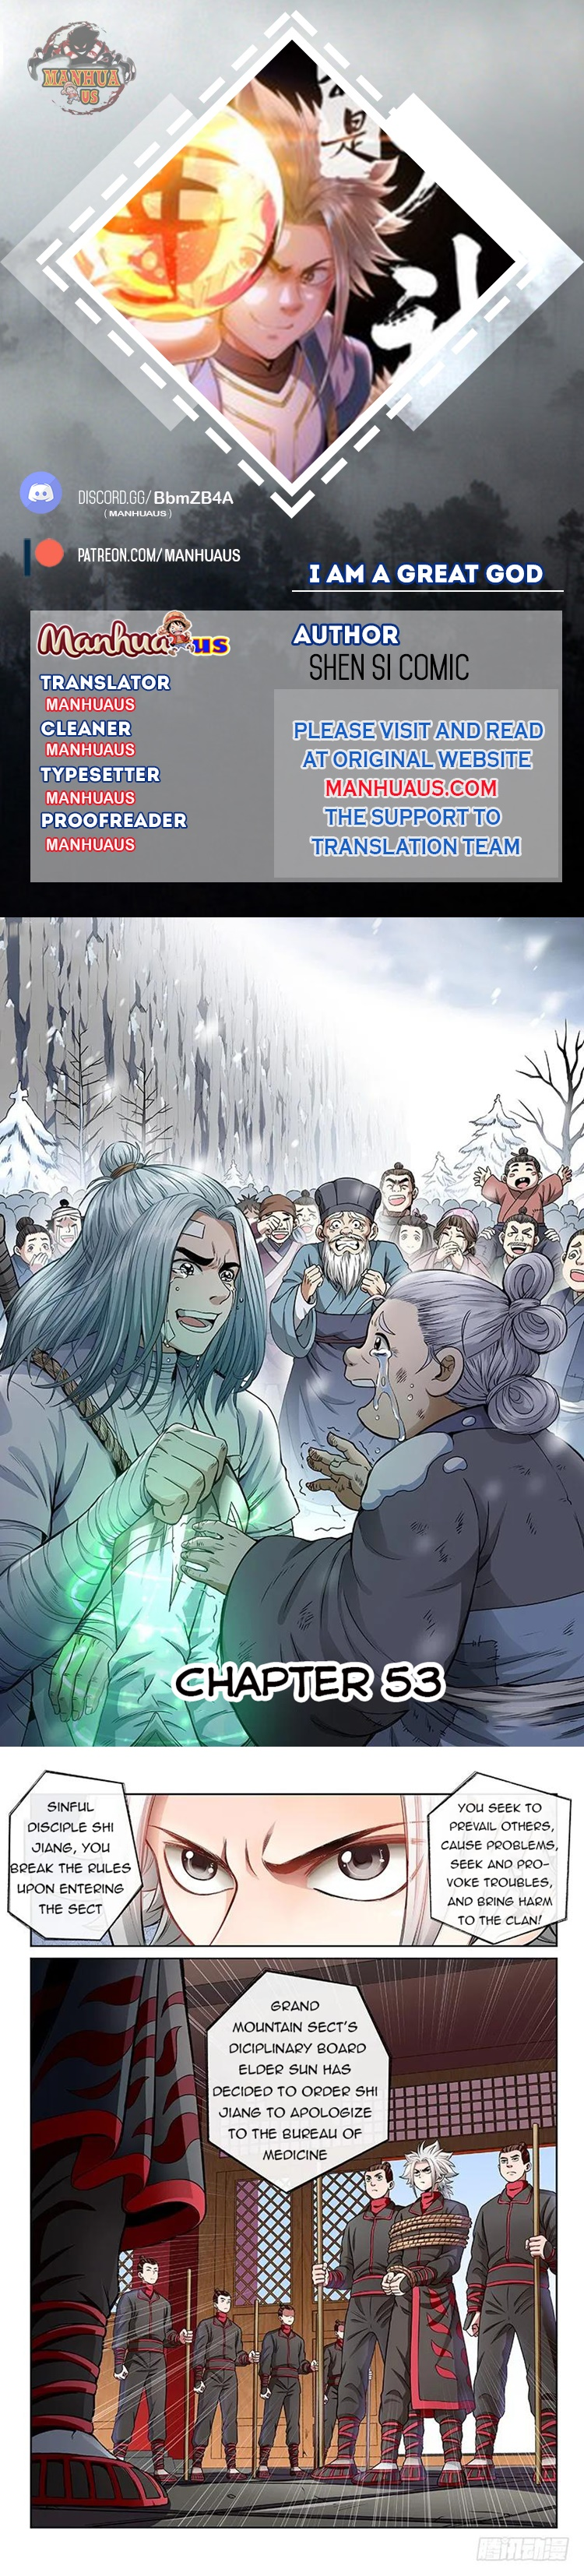 https://manga.mangadogs.com/comics/pic4/4/21124/2823084/18f91a9f059ec0d149538d6800cc9027.jpg Page 1